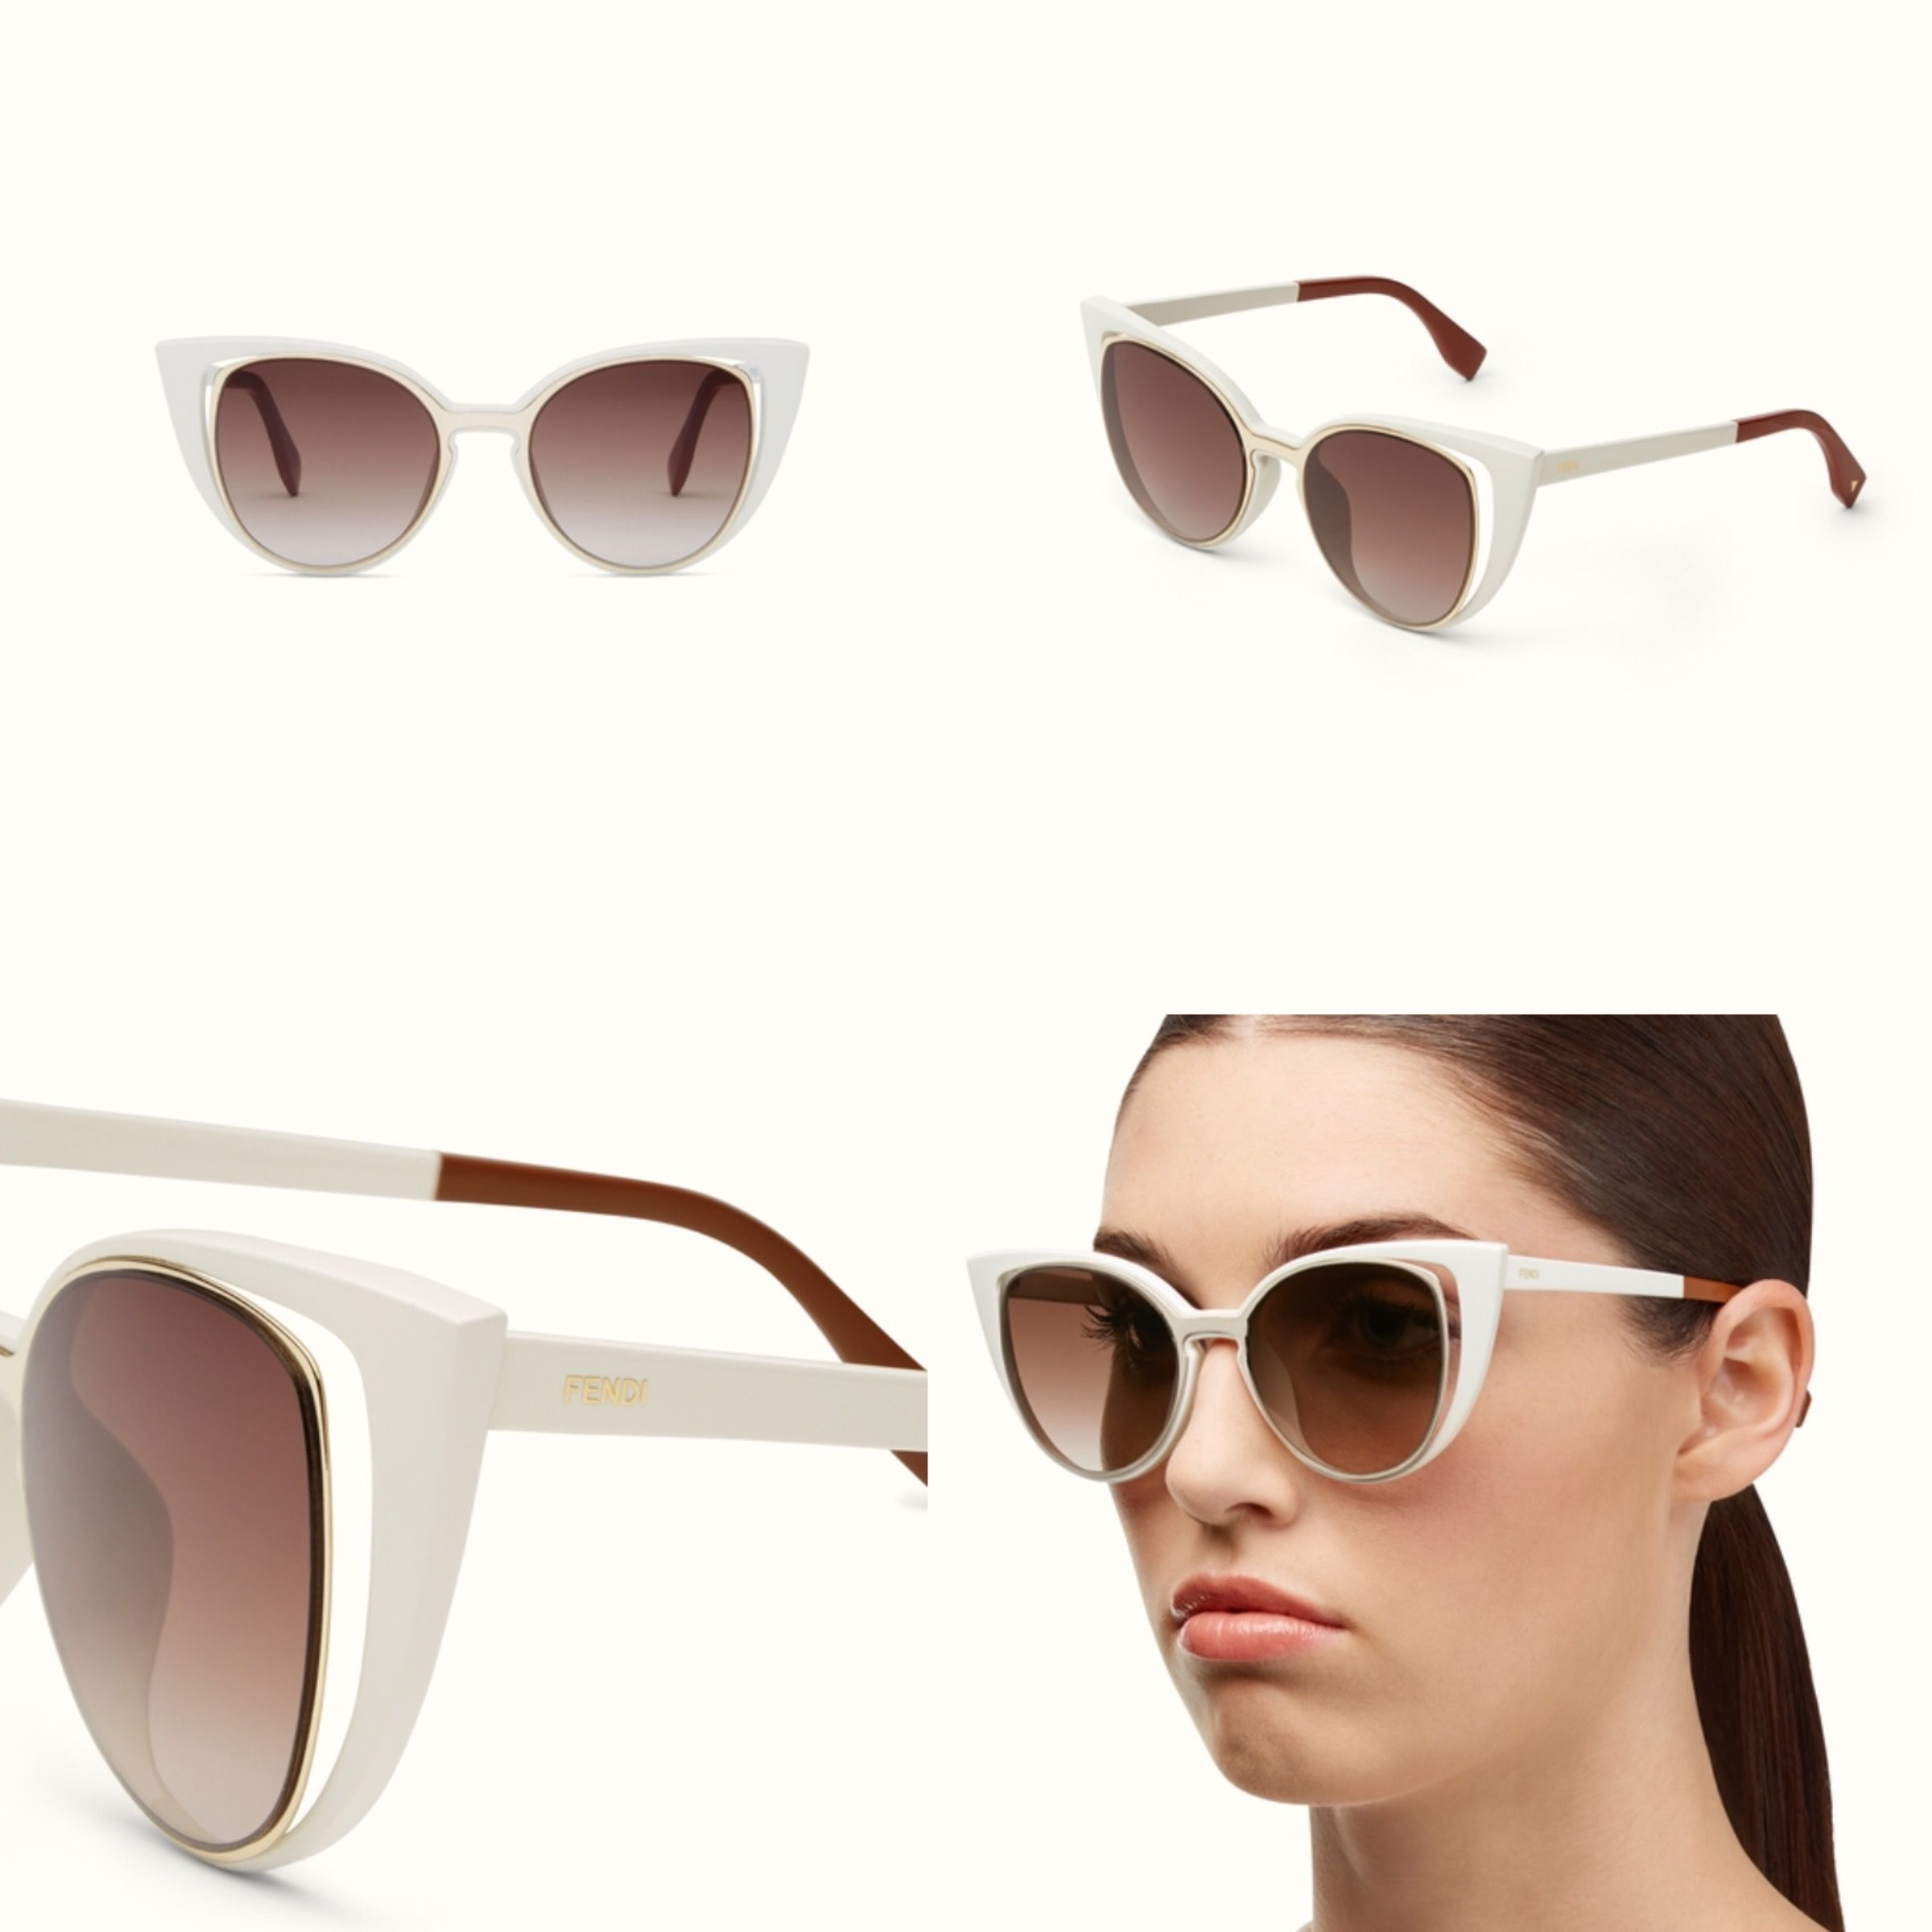 ee4e9758 FENDI PARADEYES Sunglasses White cat-eye double frame sunglasses ...